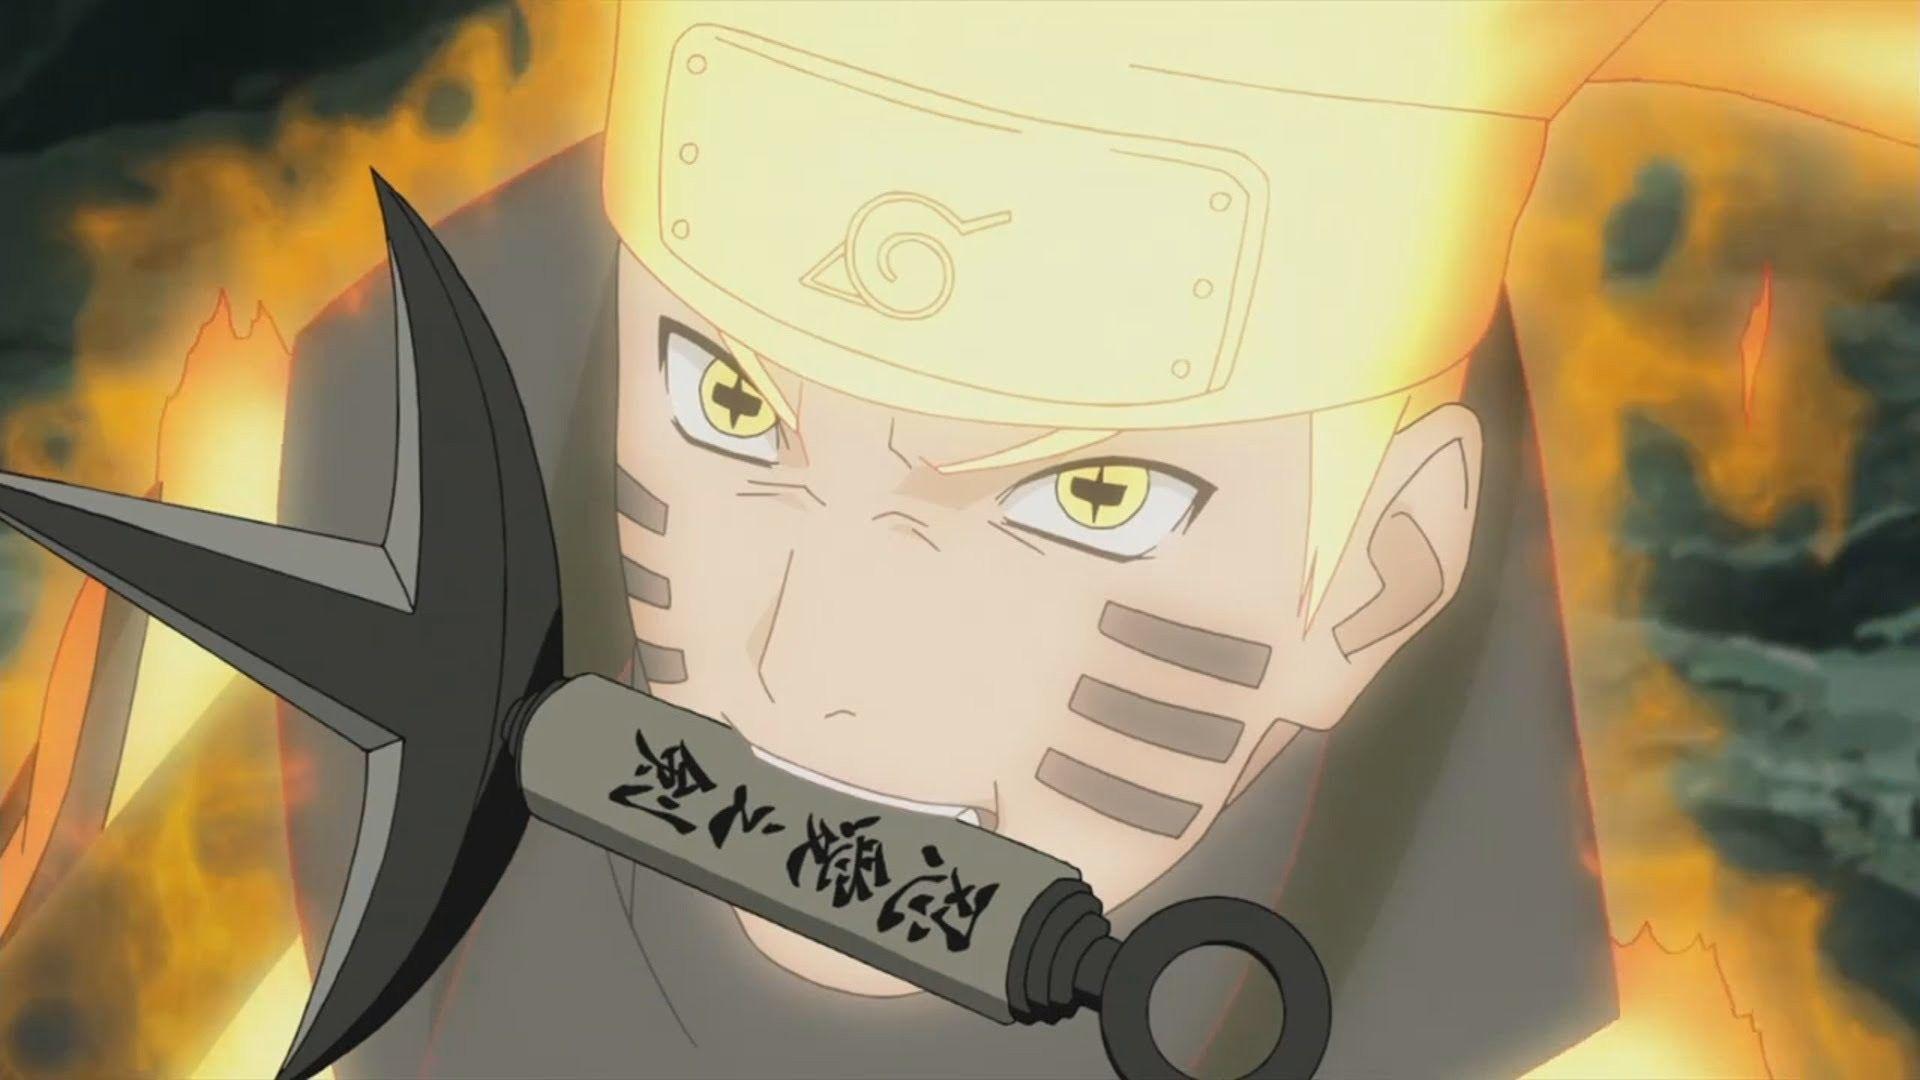 10 Jinchuriki Terkuat di Anime Naruto 10